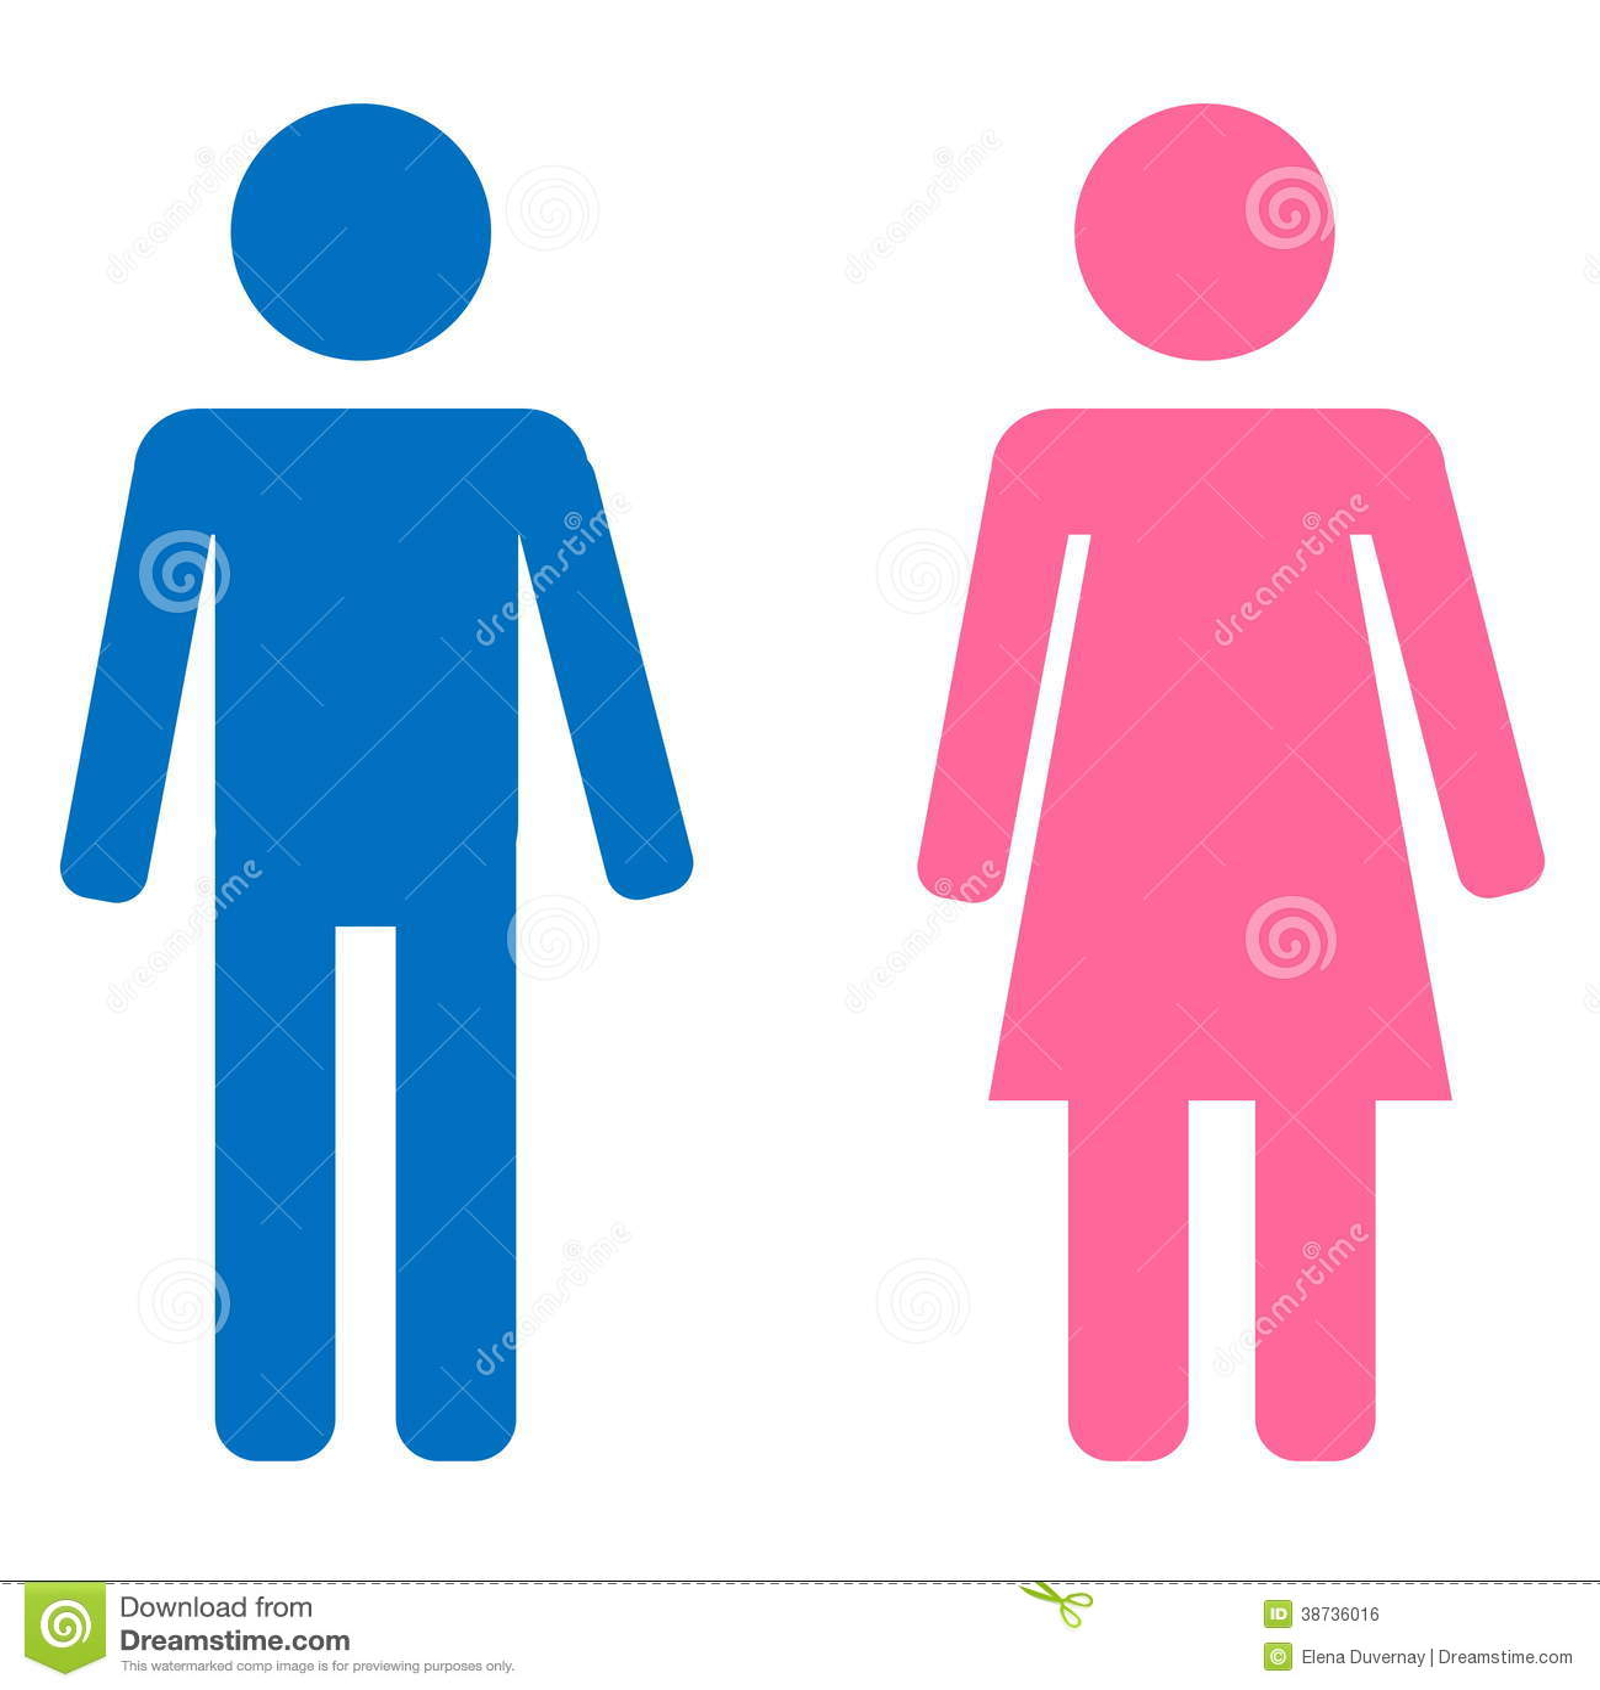 male girl